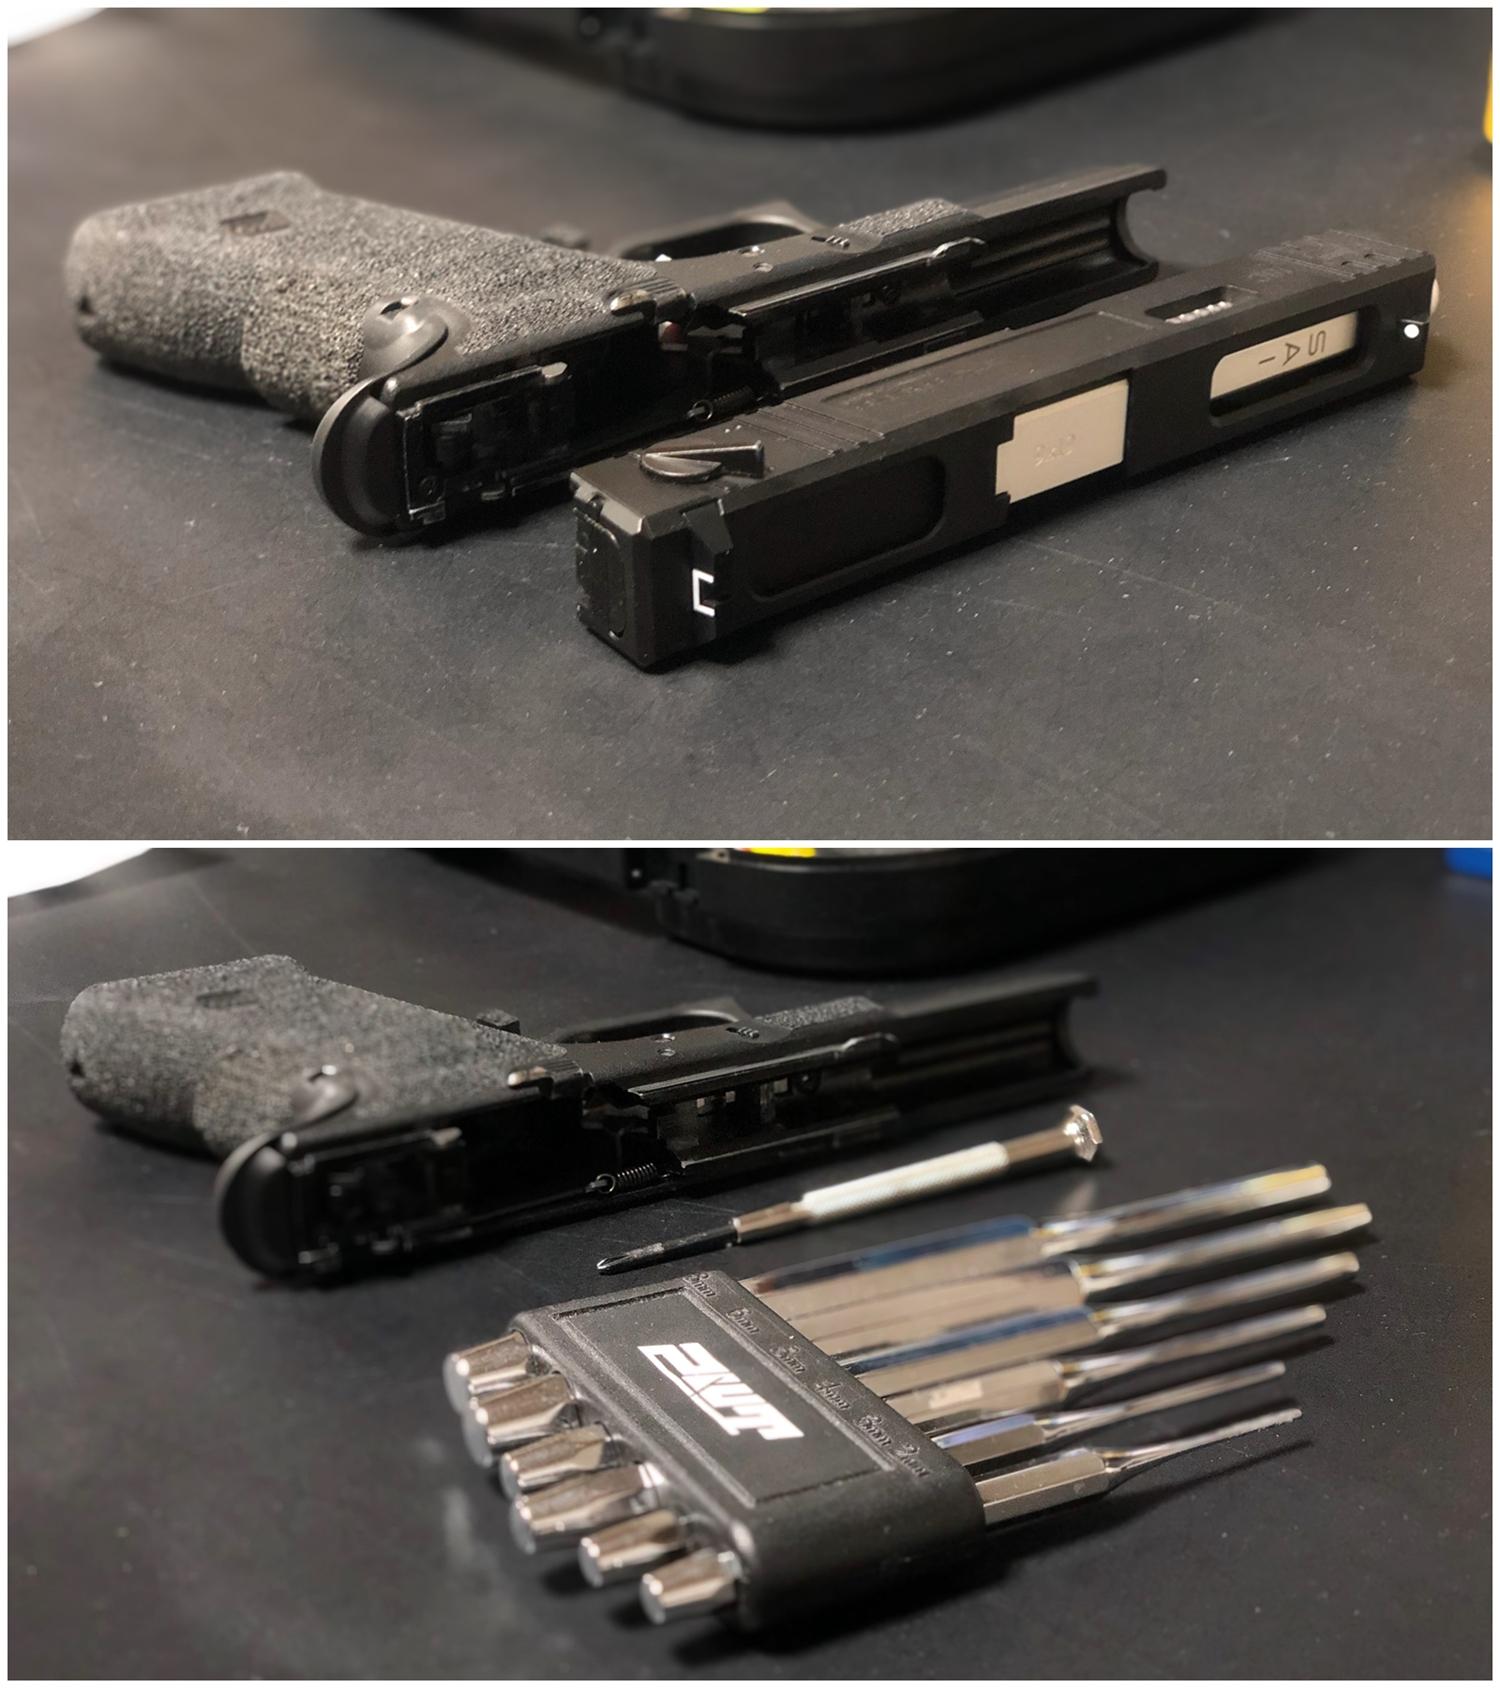 5 GunsModify GLOCK SAI アジャスタブルトリガー Ver3 GM0026 GM0079 に交換してみた! GLOCK G18C カスタム 購入 分解 取付 交換 取付方法 レビュー!!